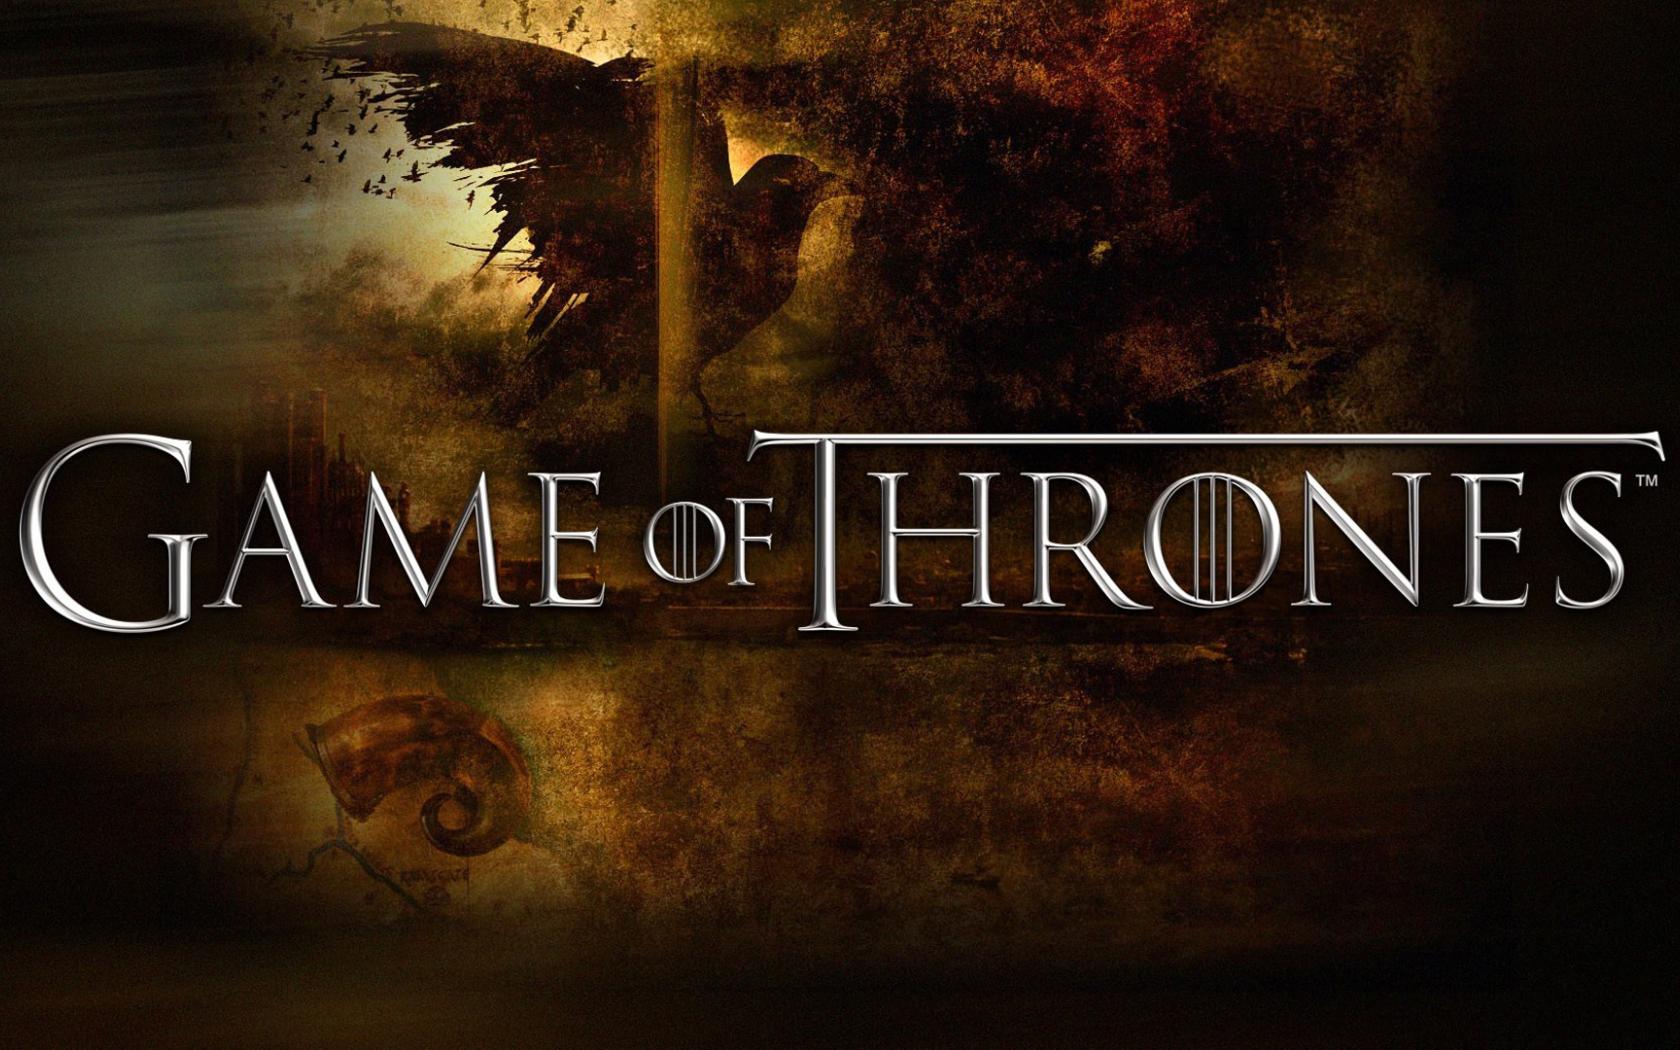 Free Download Game Of Thrones Season 6 Wallpaper Full Hd